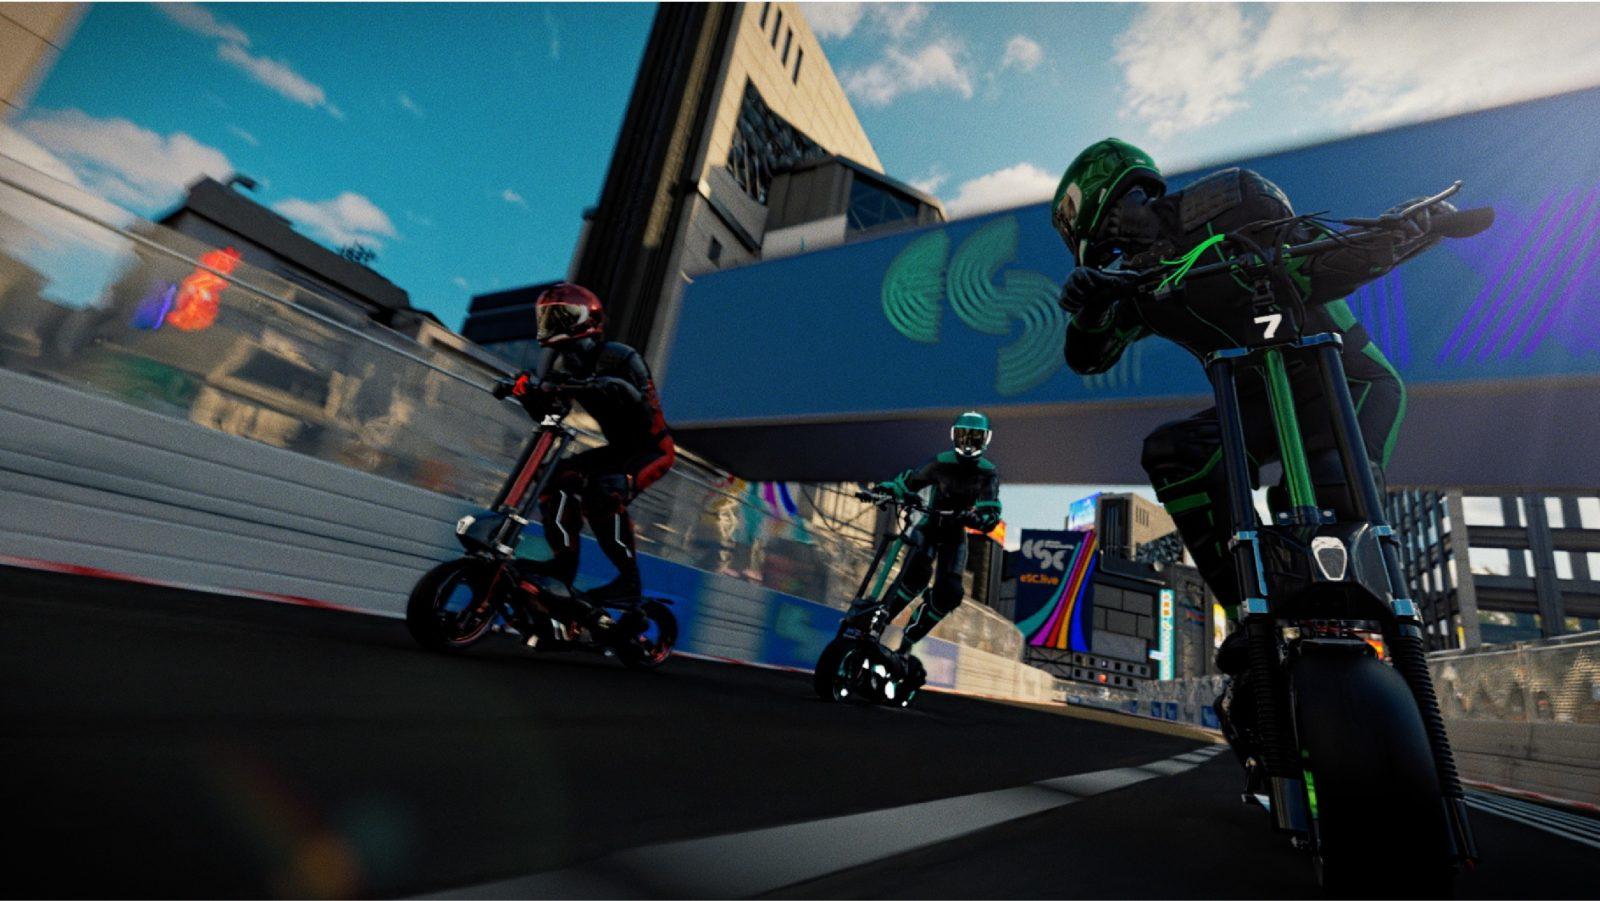 ESC elektrikli scooter yarışları